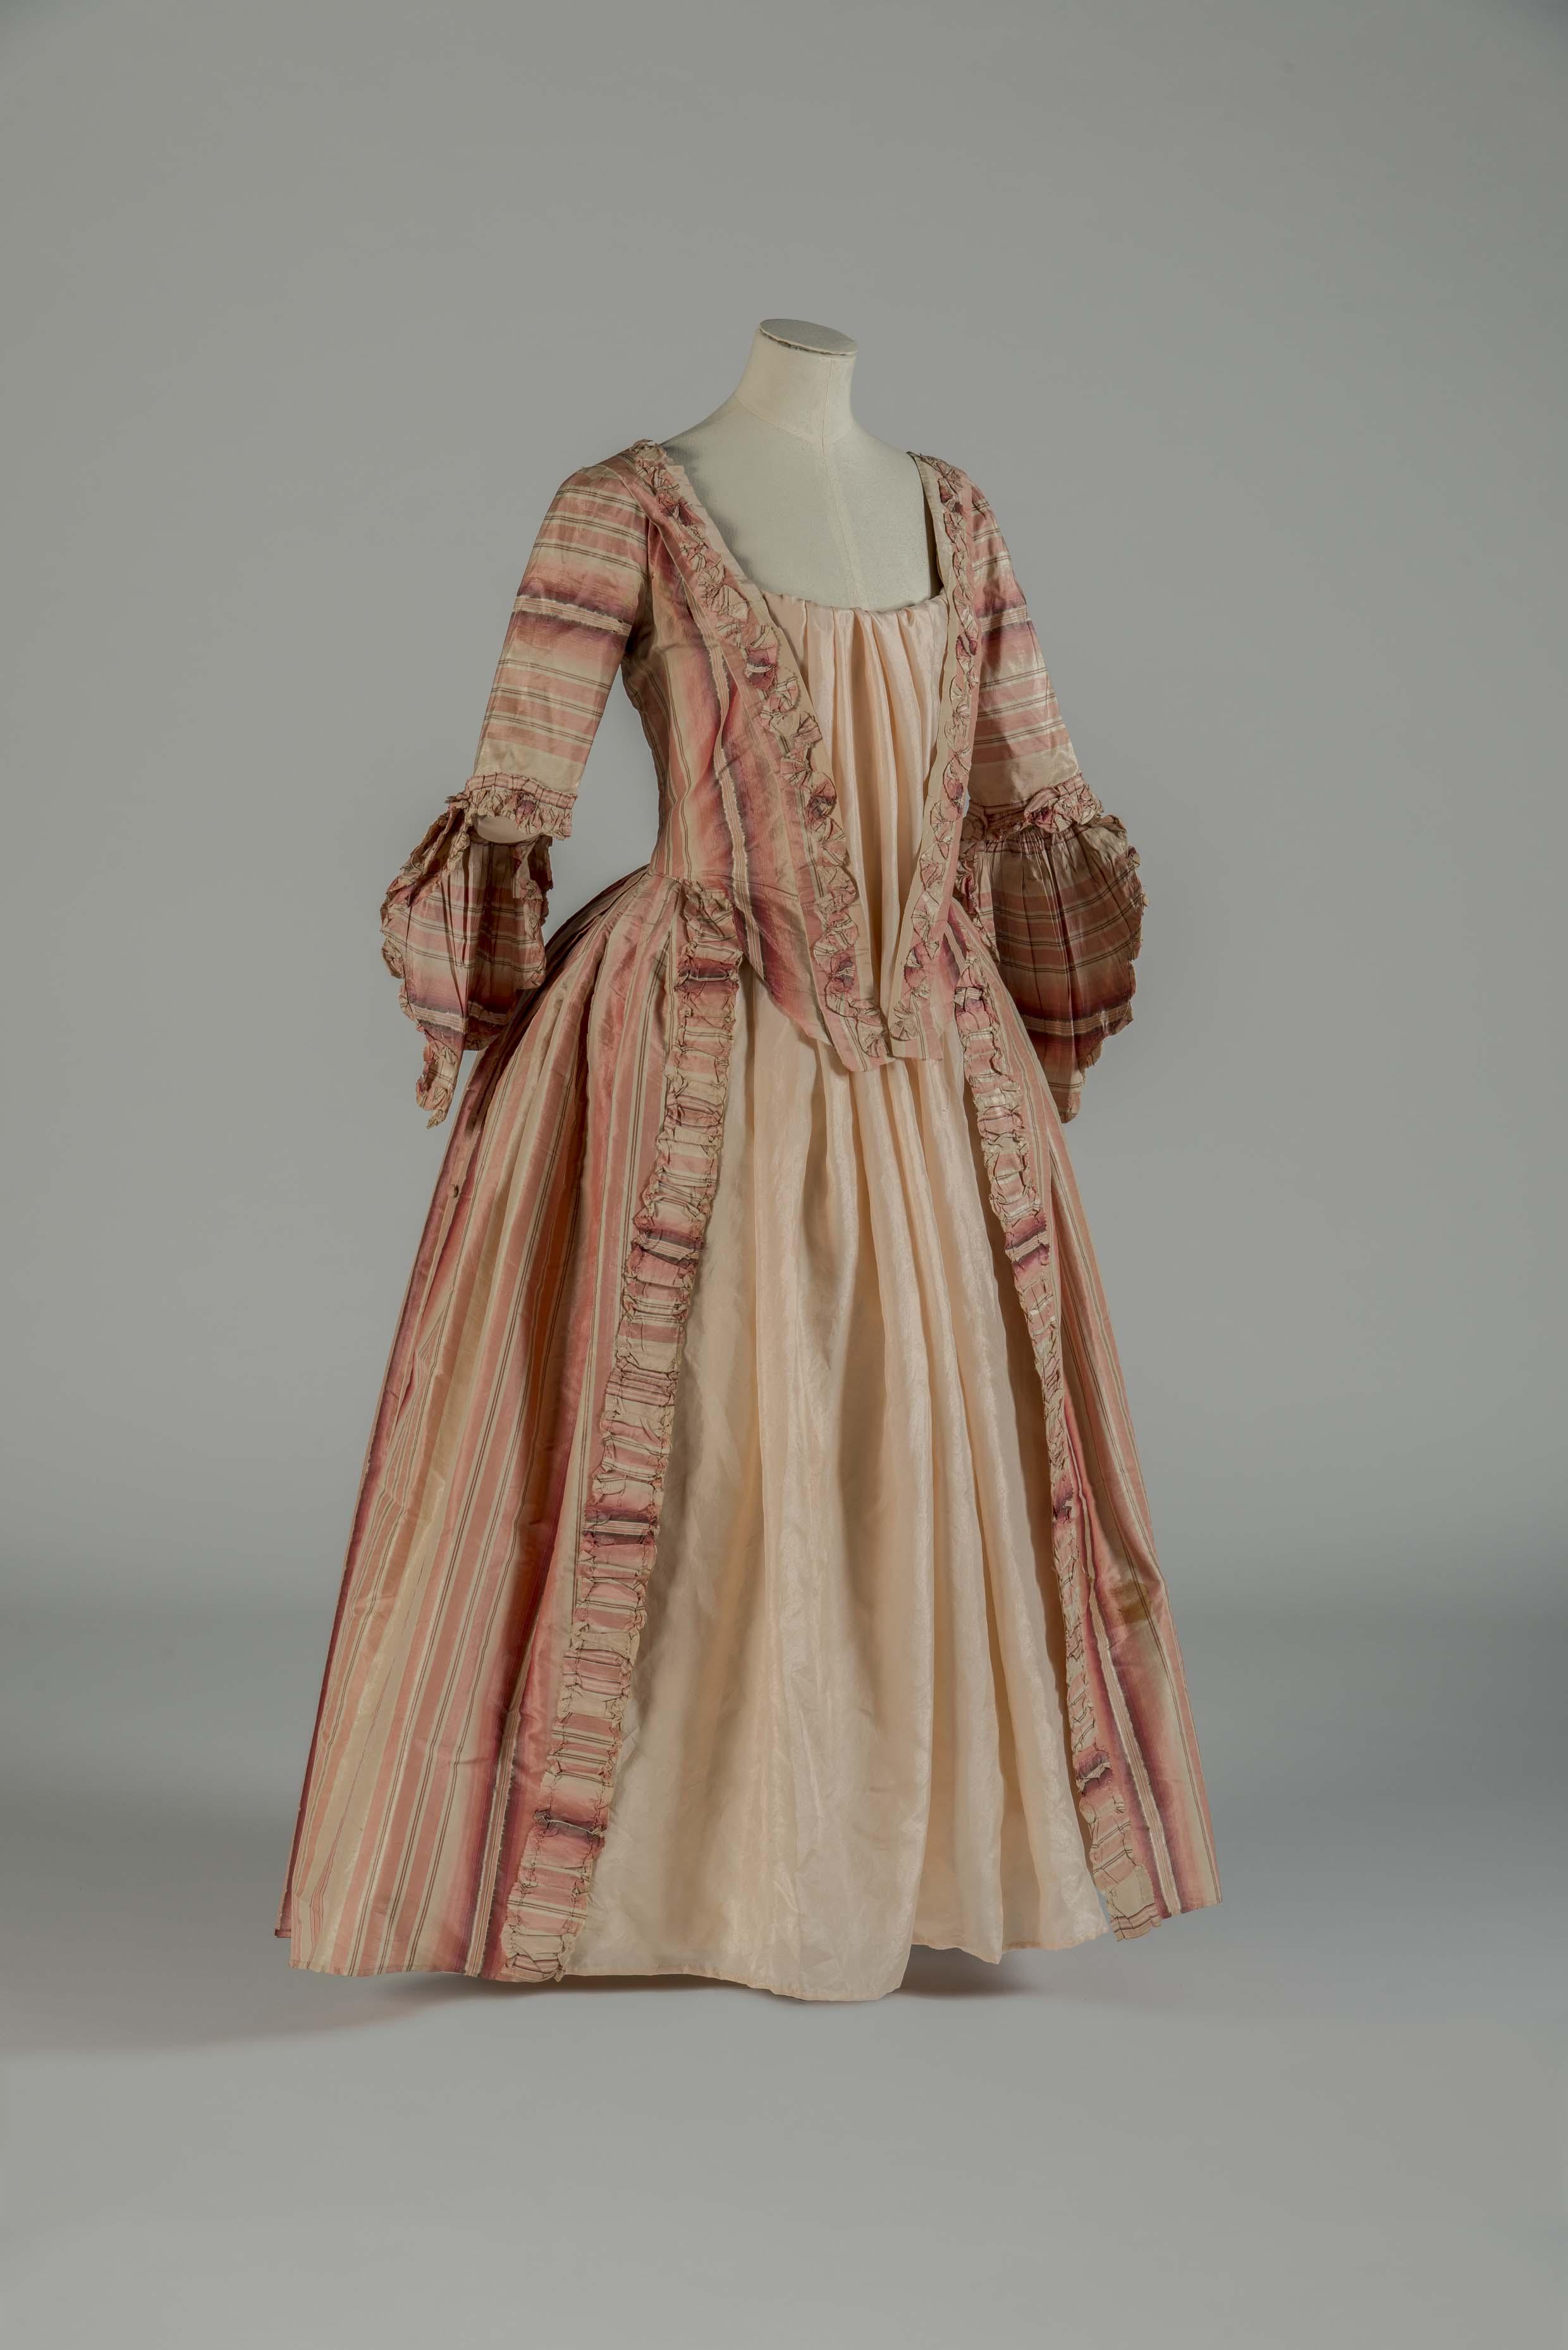 18th century european fashion